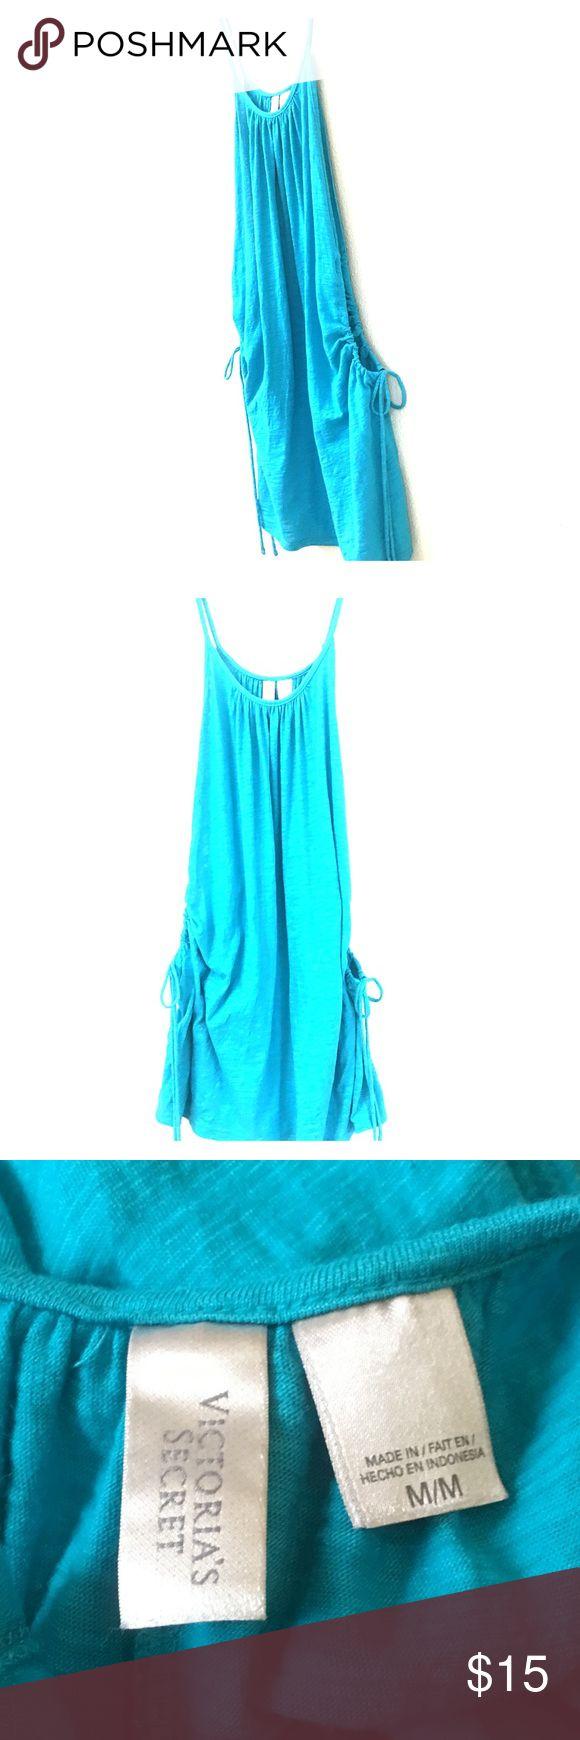 Victoria's Secret Sun Dress Swim Cover Good condition. Hem line is upper thigh. Side's of dress drape down. Tie on each side. Victoria's Secret Dresses Mini